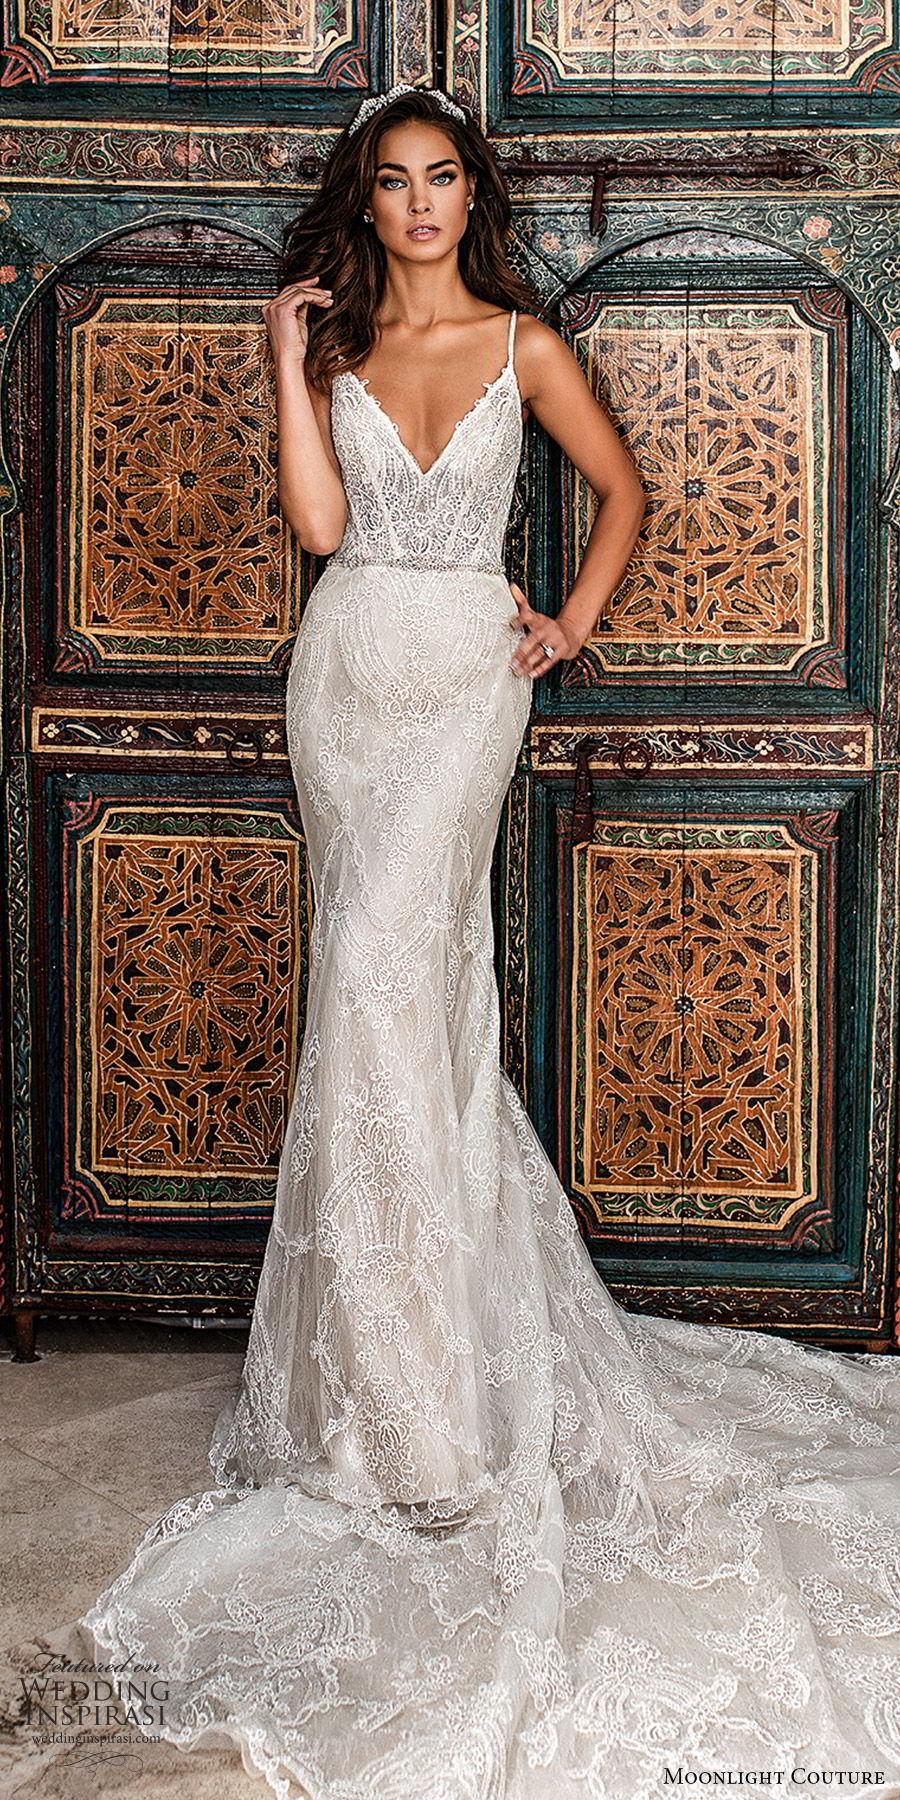 moonlight couture fall 2019 bridal sleeveless thin straps v neckling fully embellished lace sheath wedding dress (5) glam elegant sophisticated chapel train low back mv